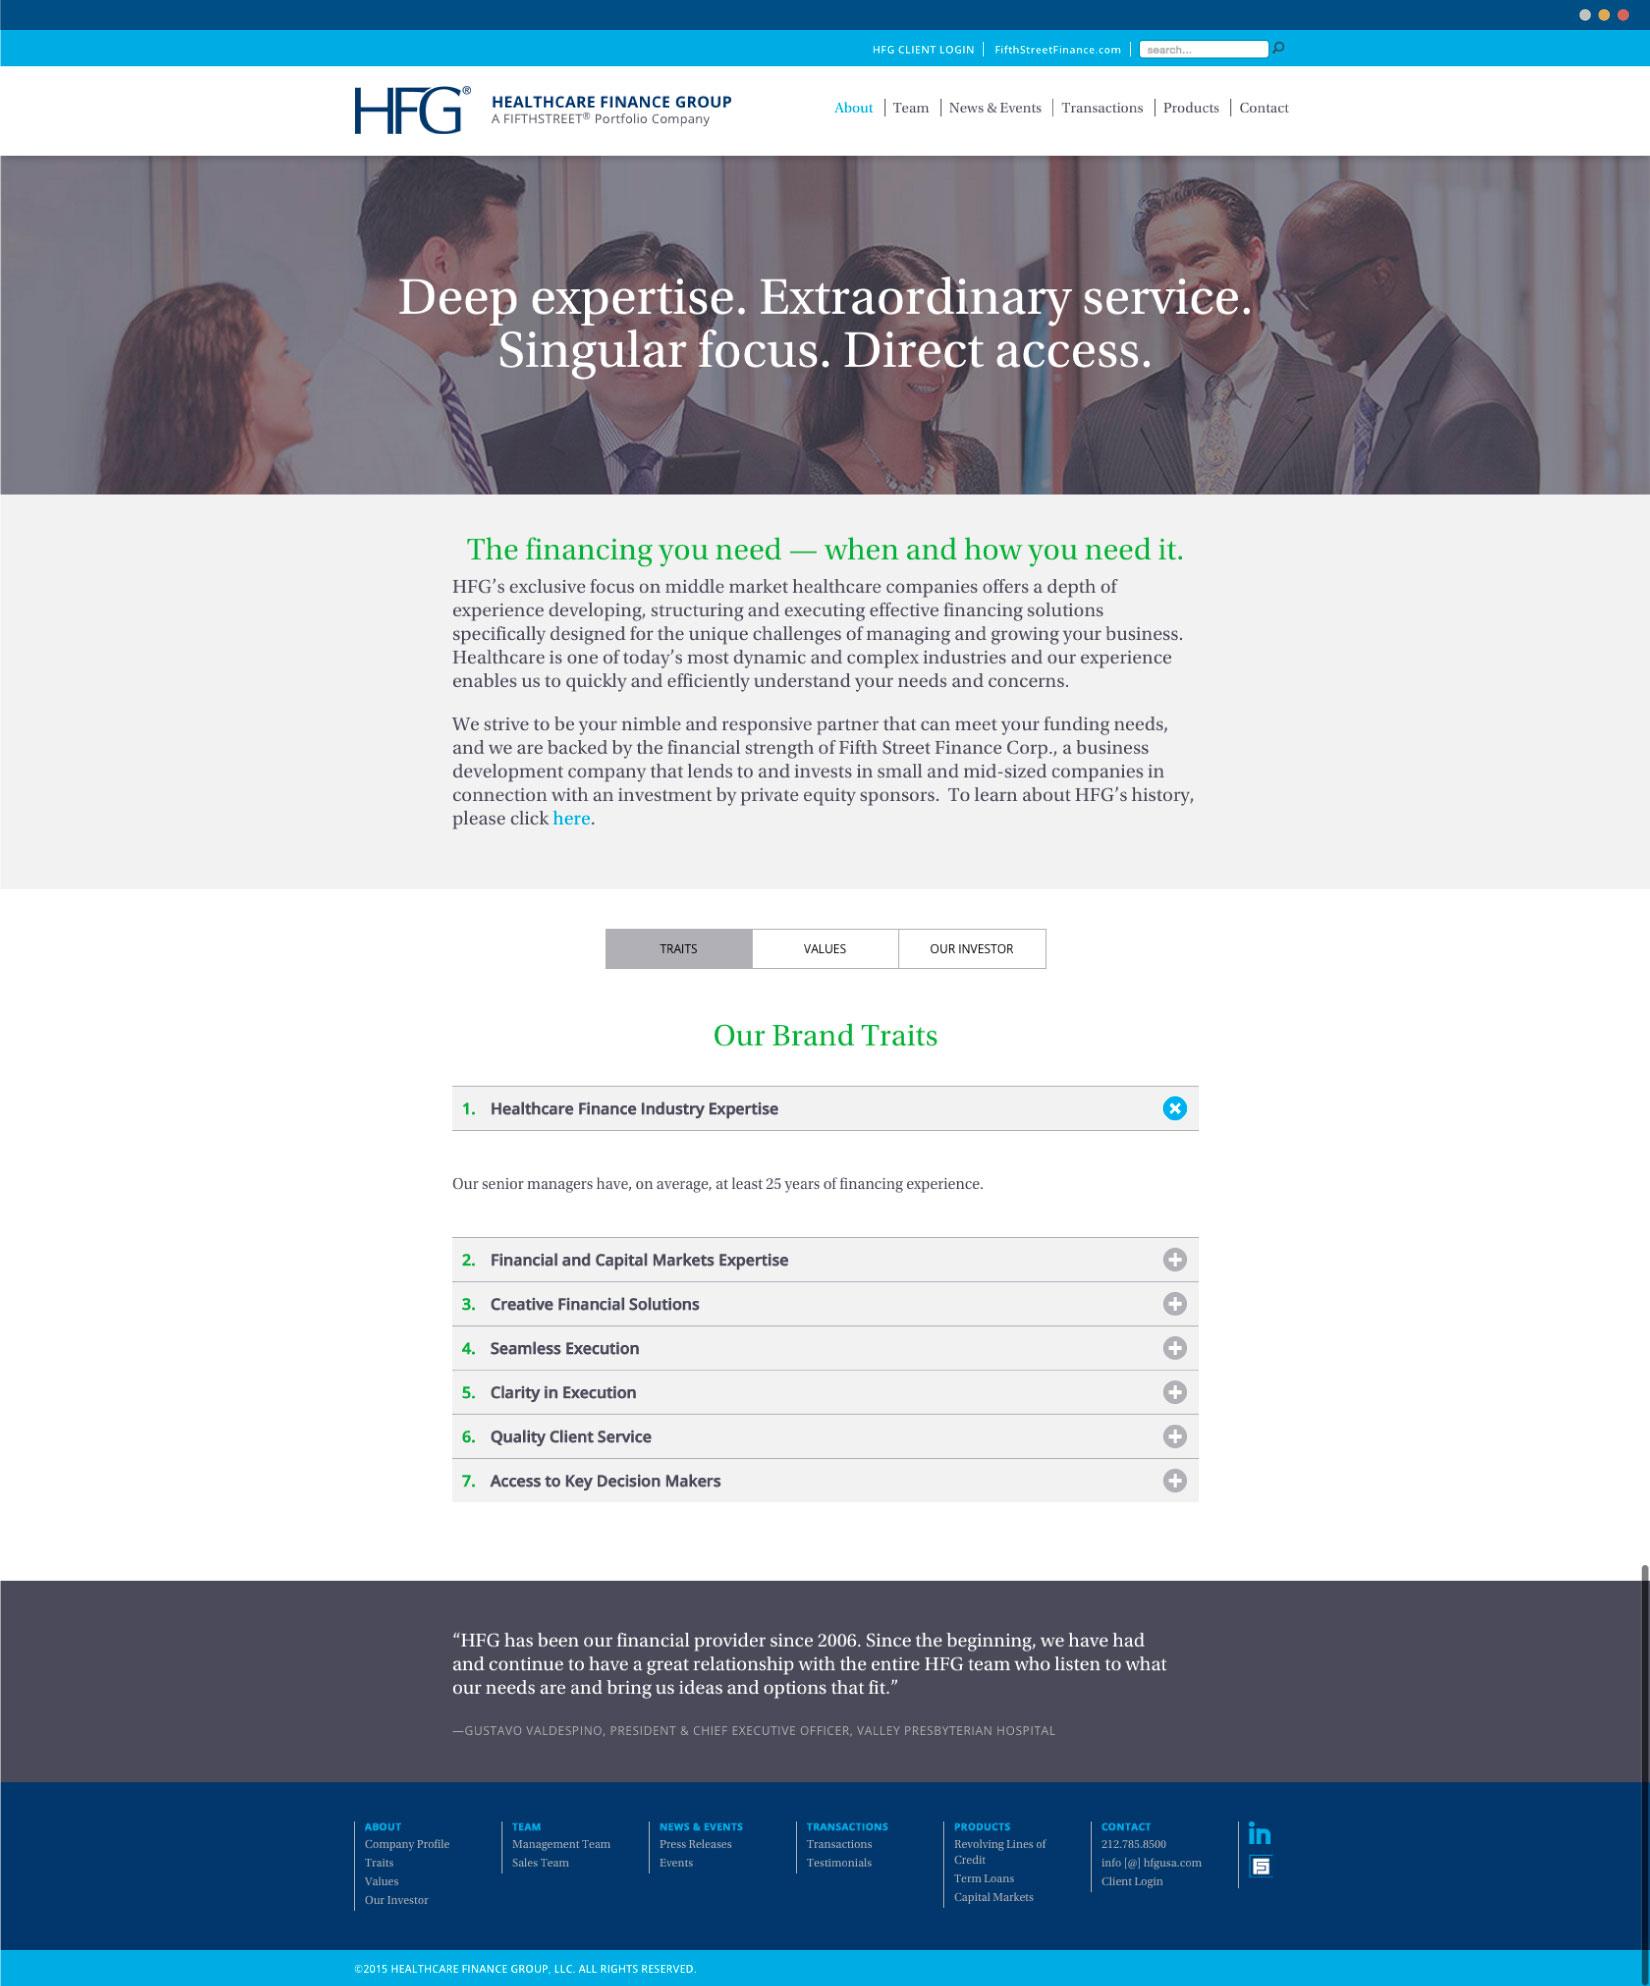 hfg website